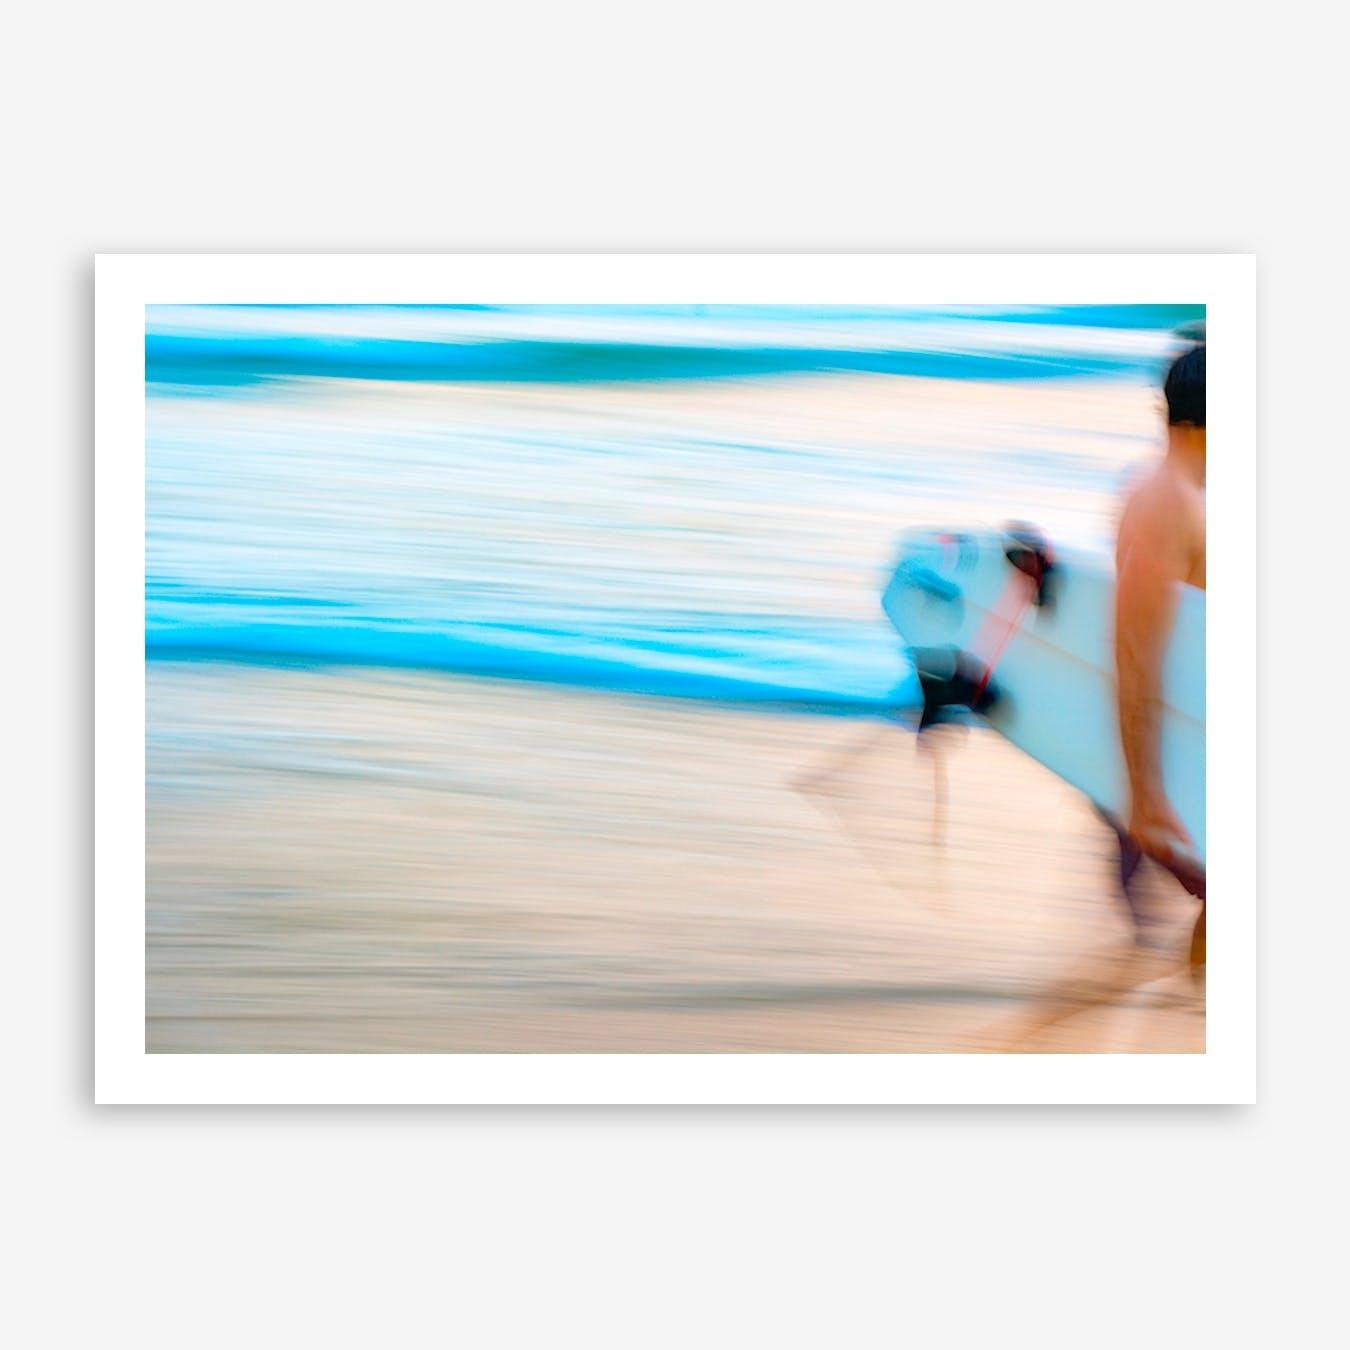 Seaside 2017 No. 20 Print